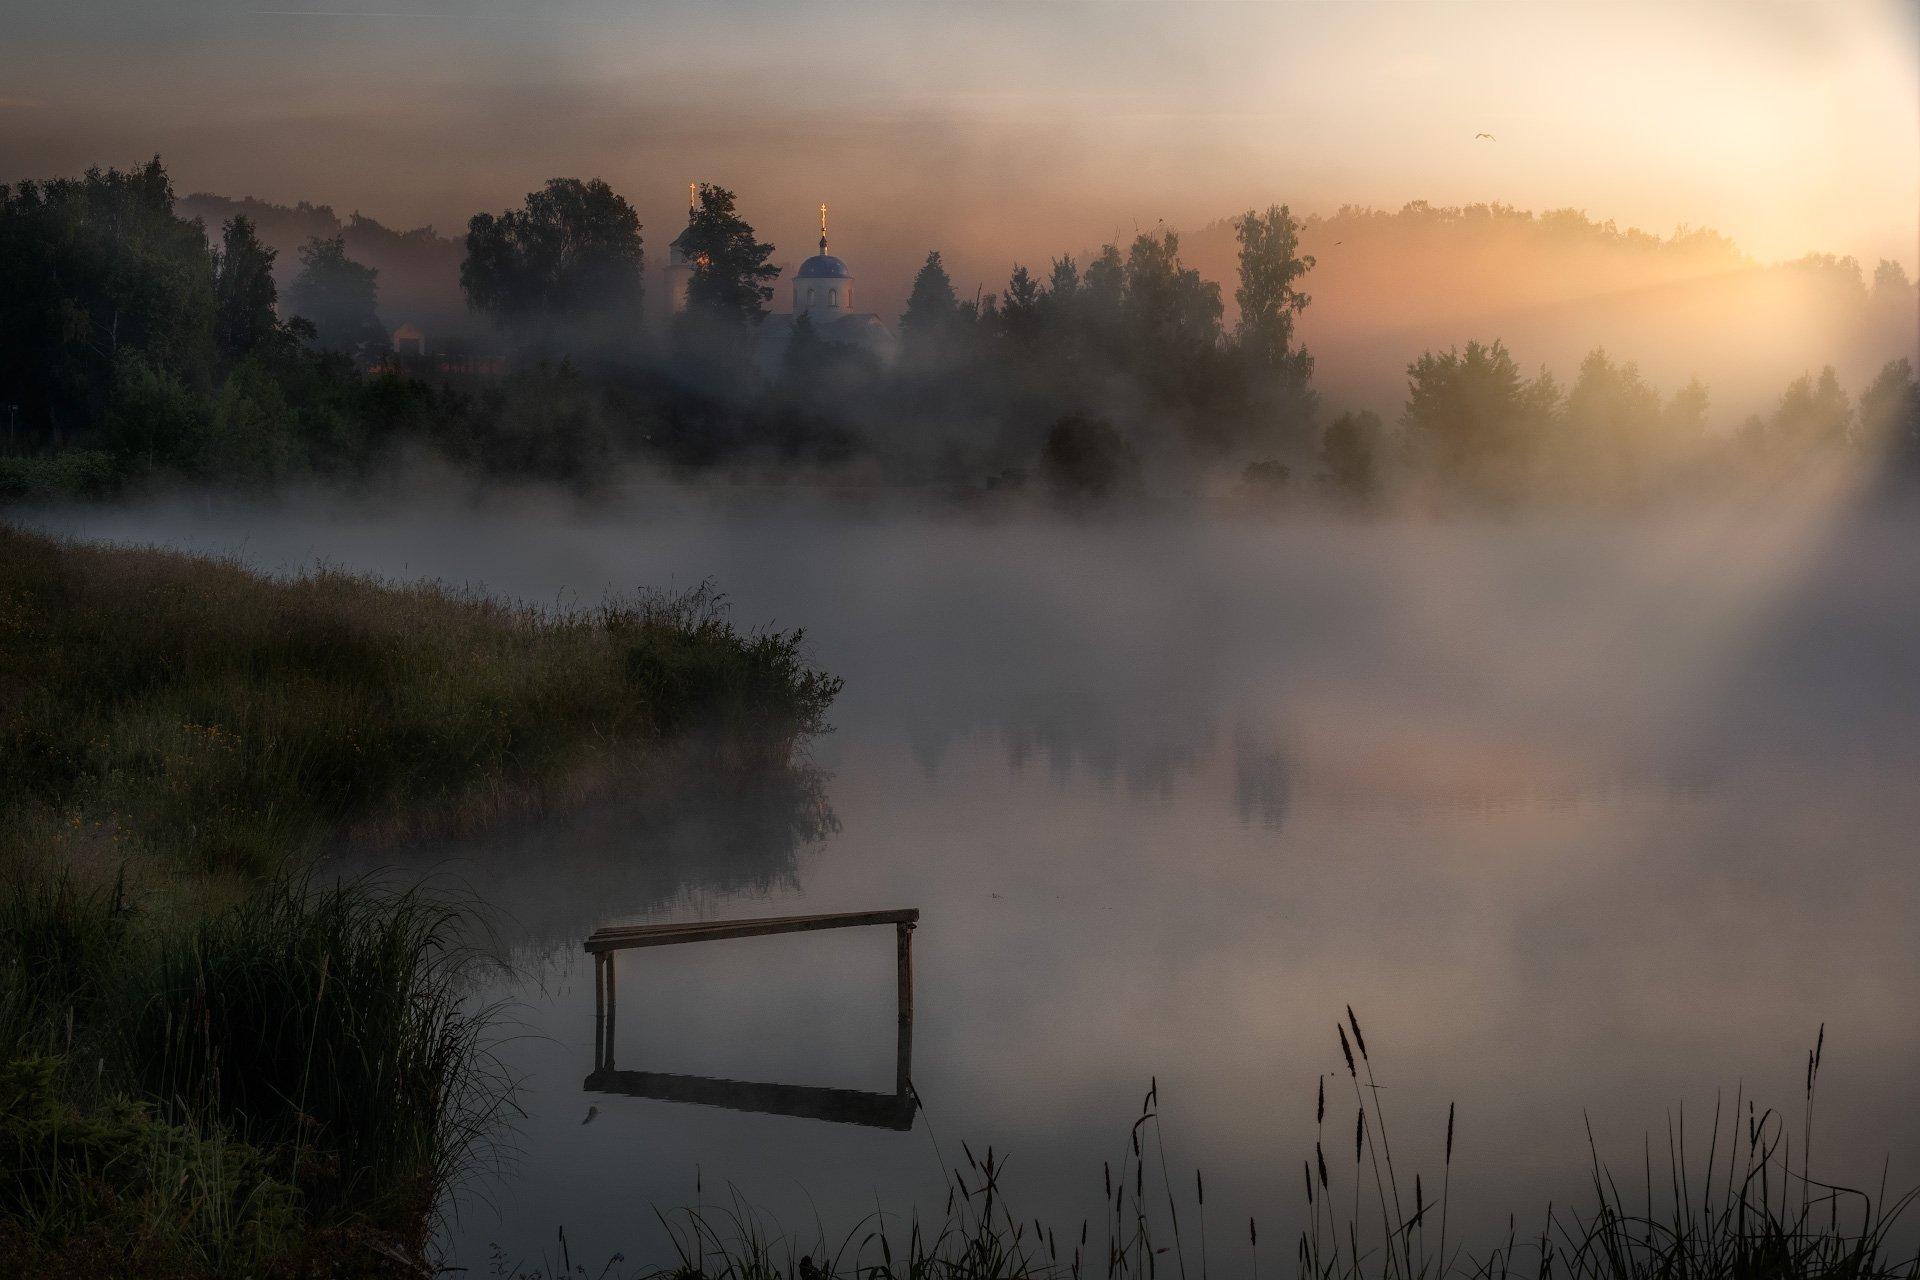 пейзаж, молокча, река, рассвет, церковь, туман, солнце, утро, Андрей Чиж